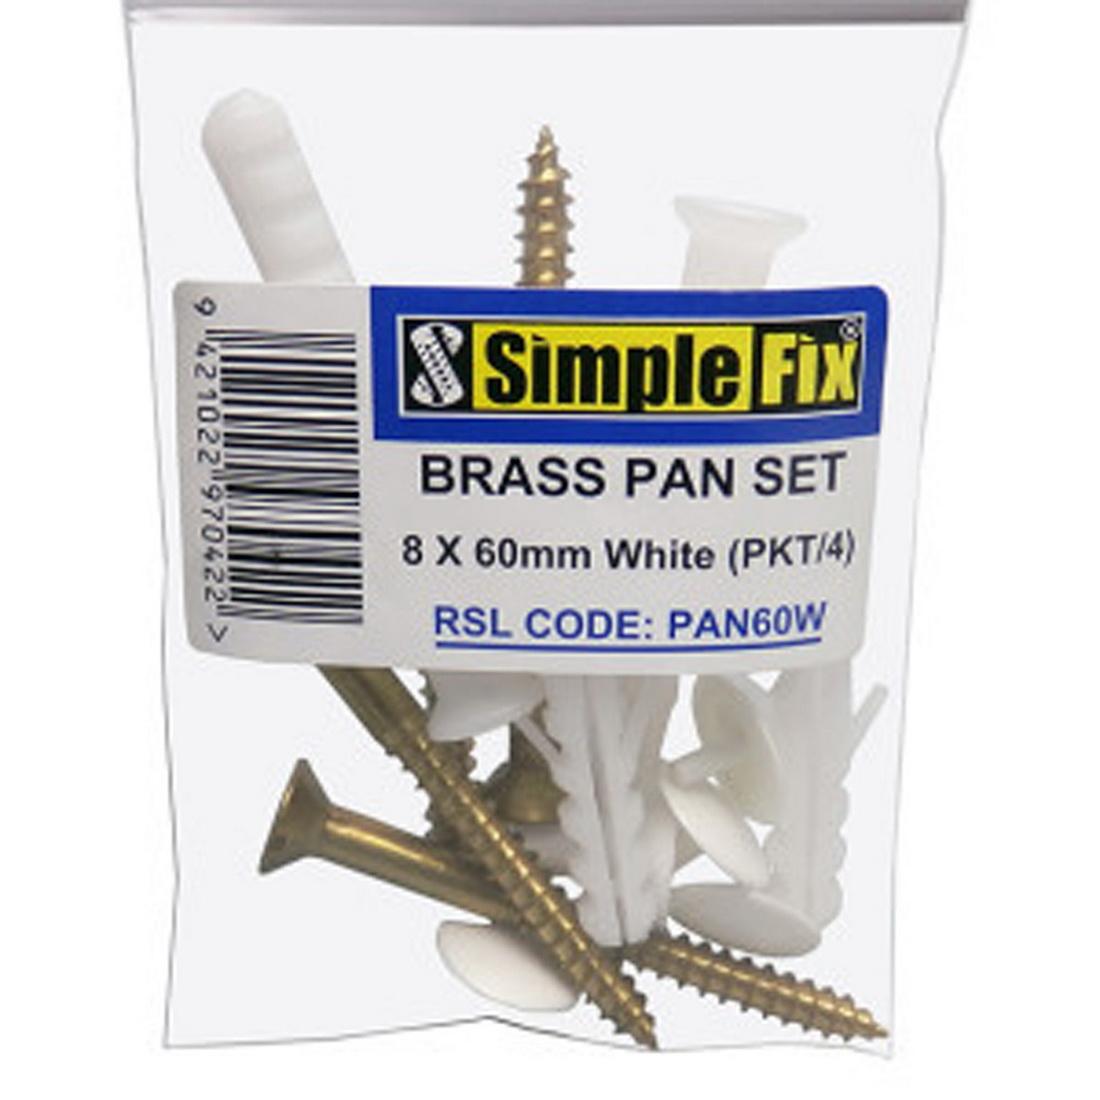 Stainless Pan Set 8 x 60mm